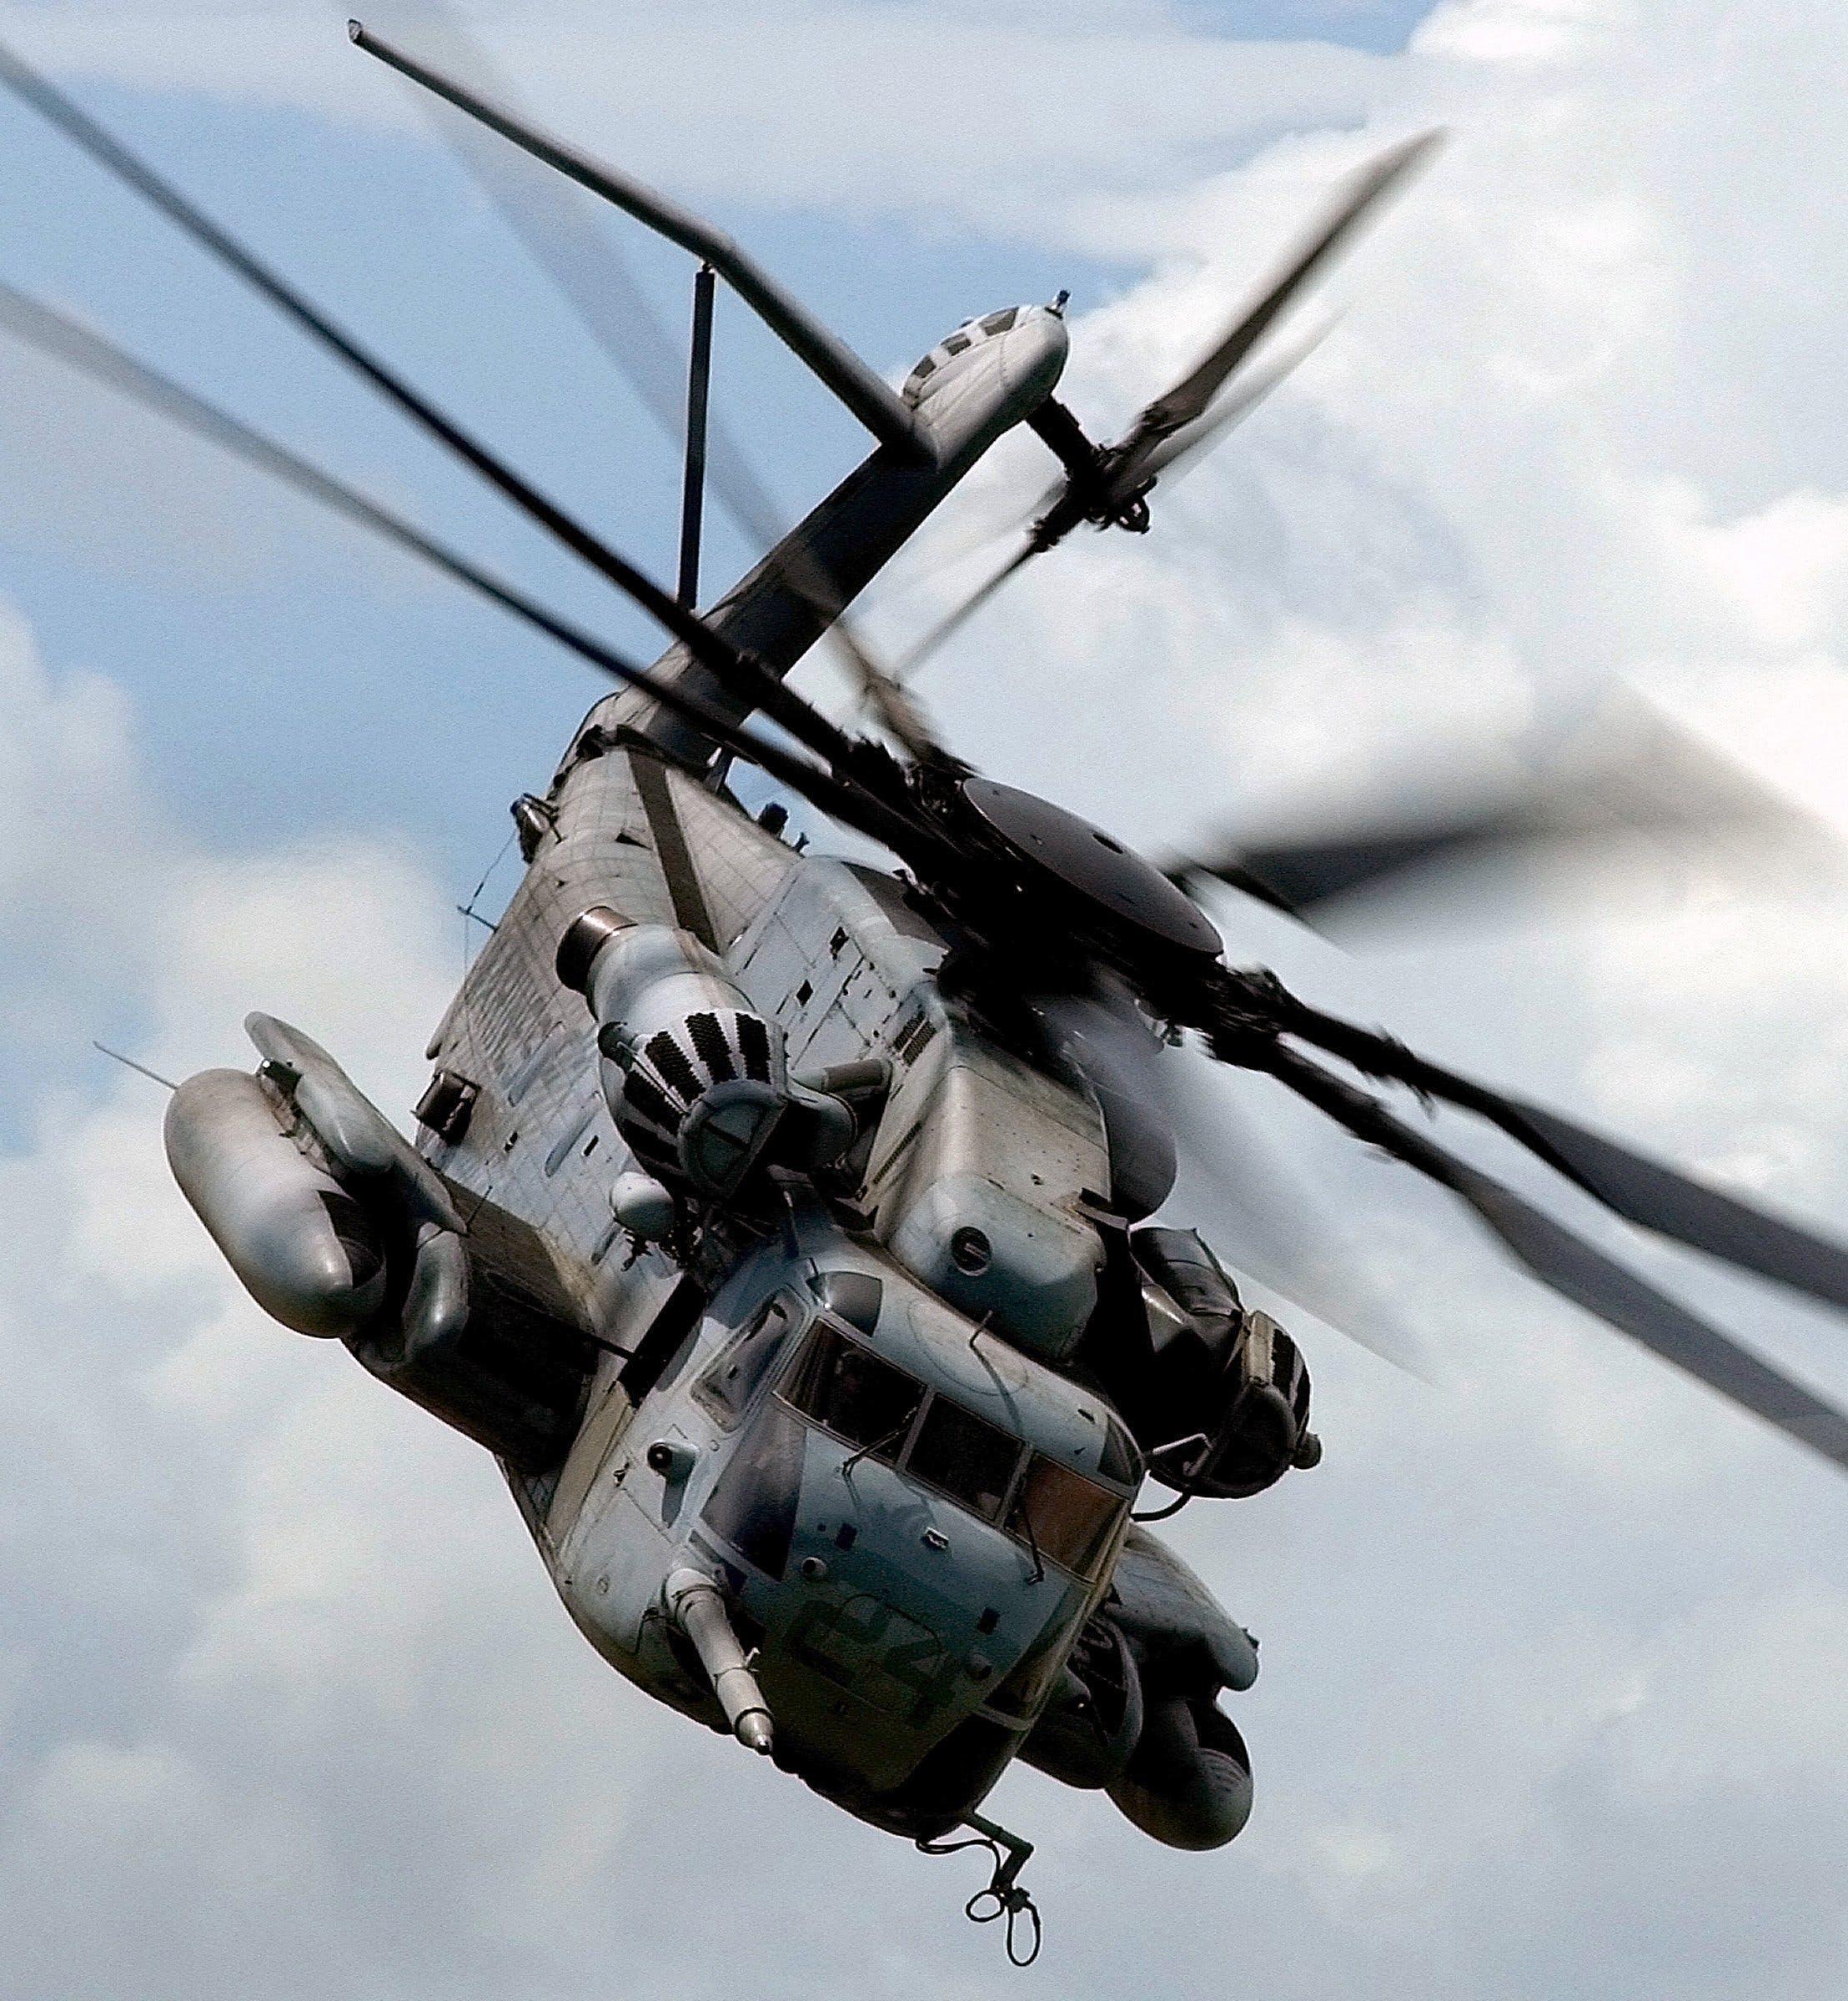 armia, granatowy, helikopter